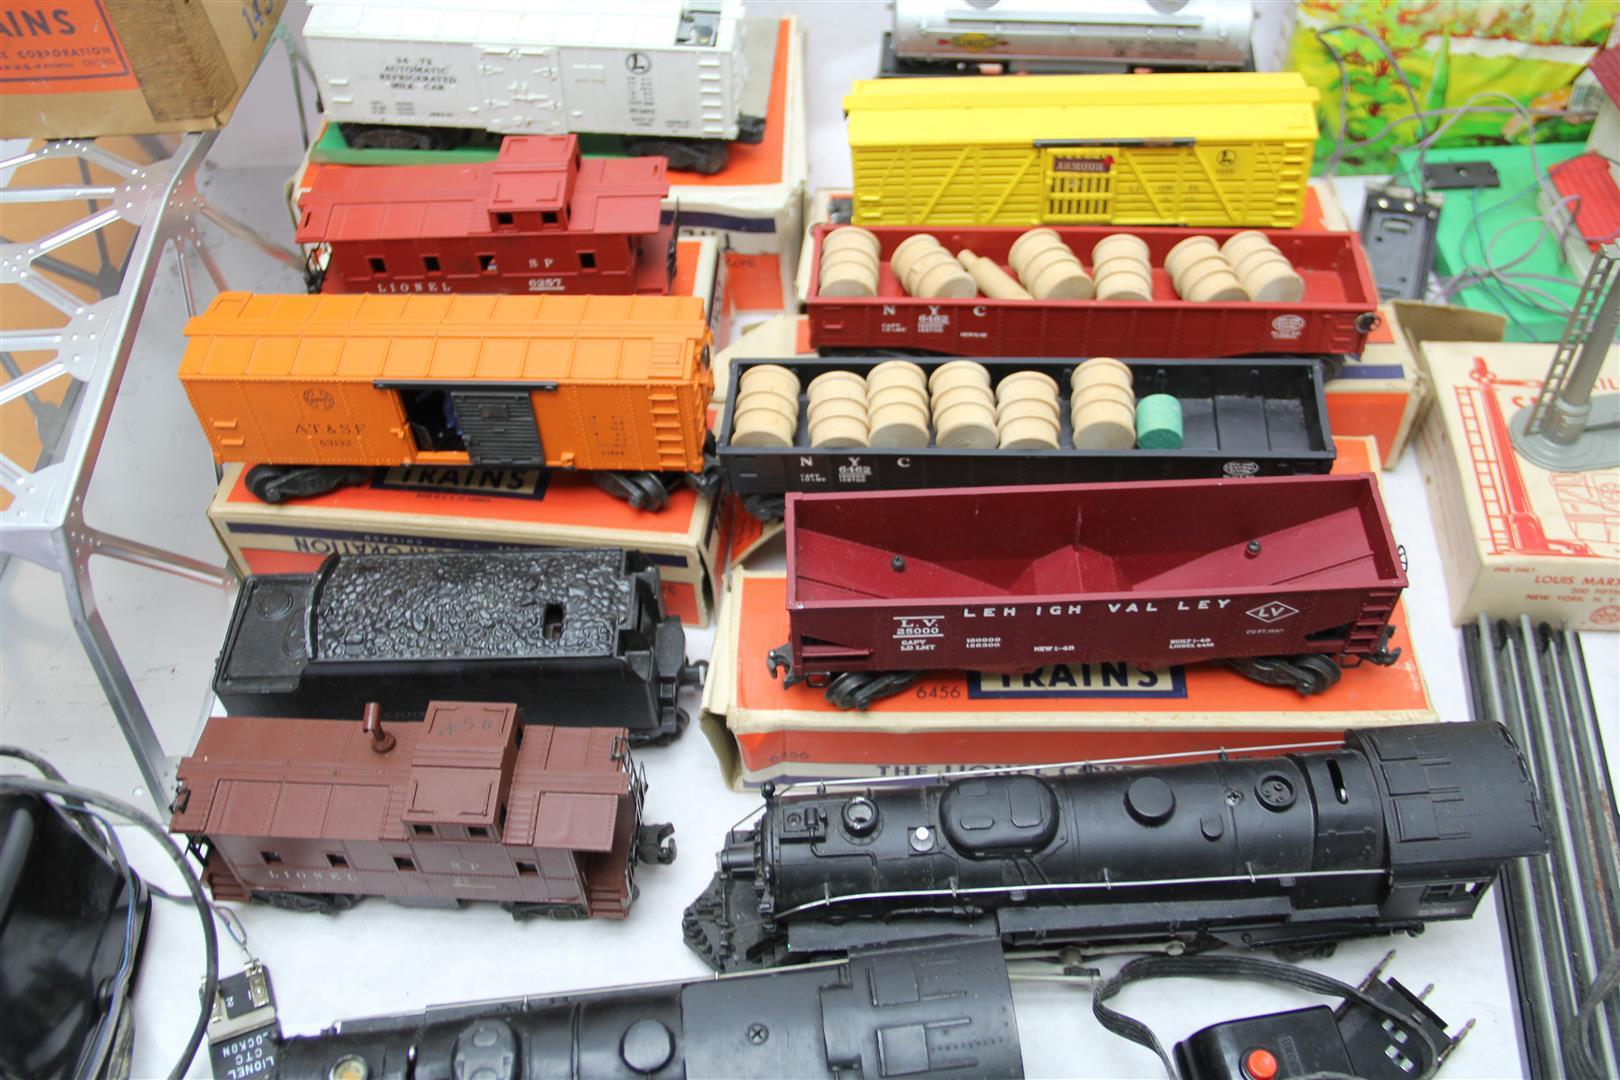 similiar rarest lionel train engines keywords rare lionel trains 5364 675 engines w 2046w 6257 3472 3464 6456 6465